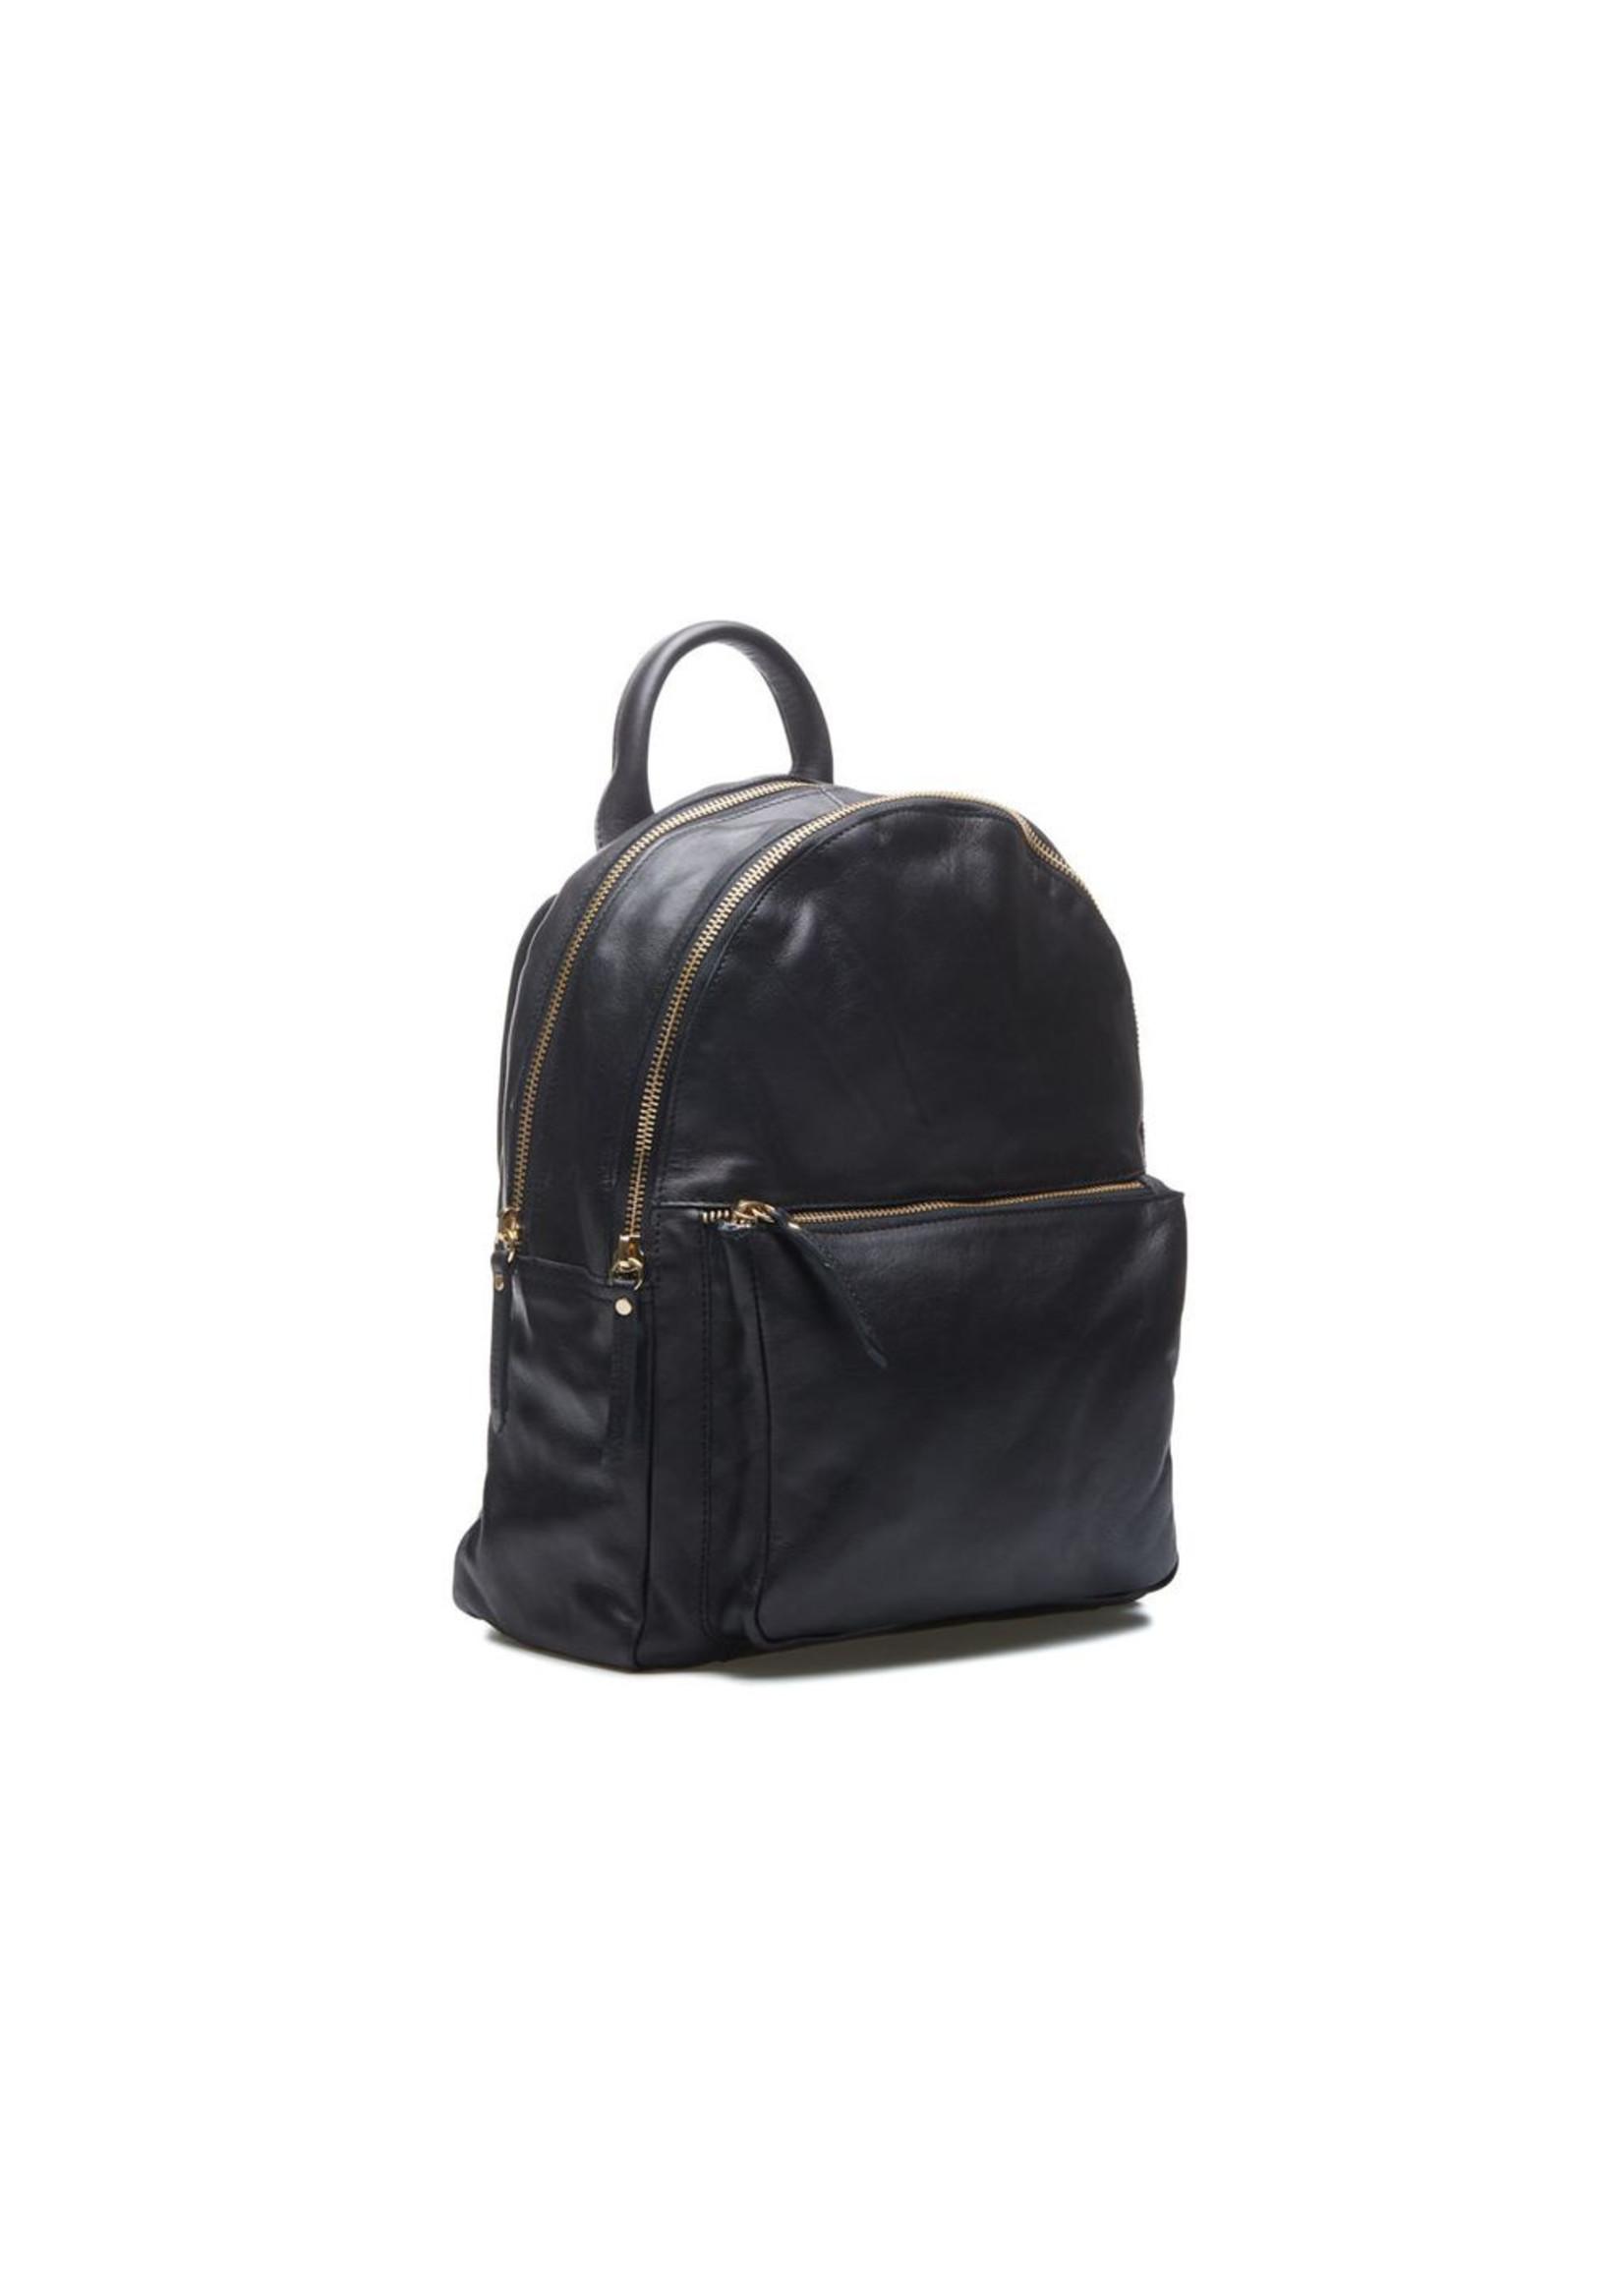 Chabo Bags Backpack Fashion Bag Zwart